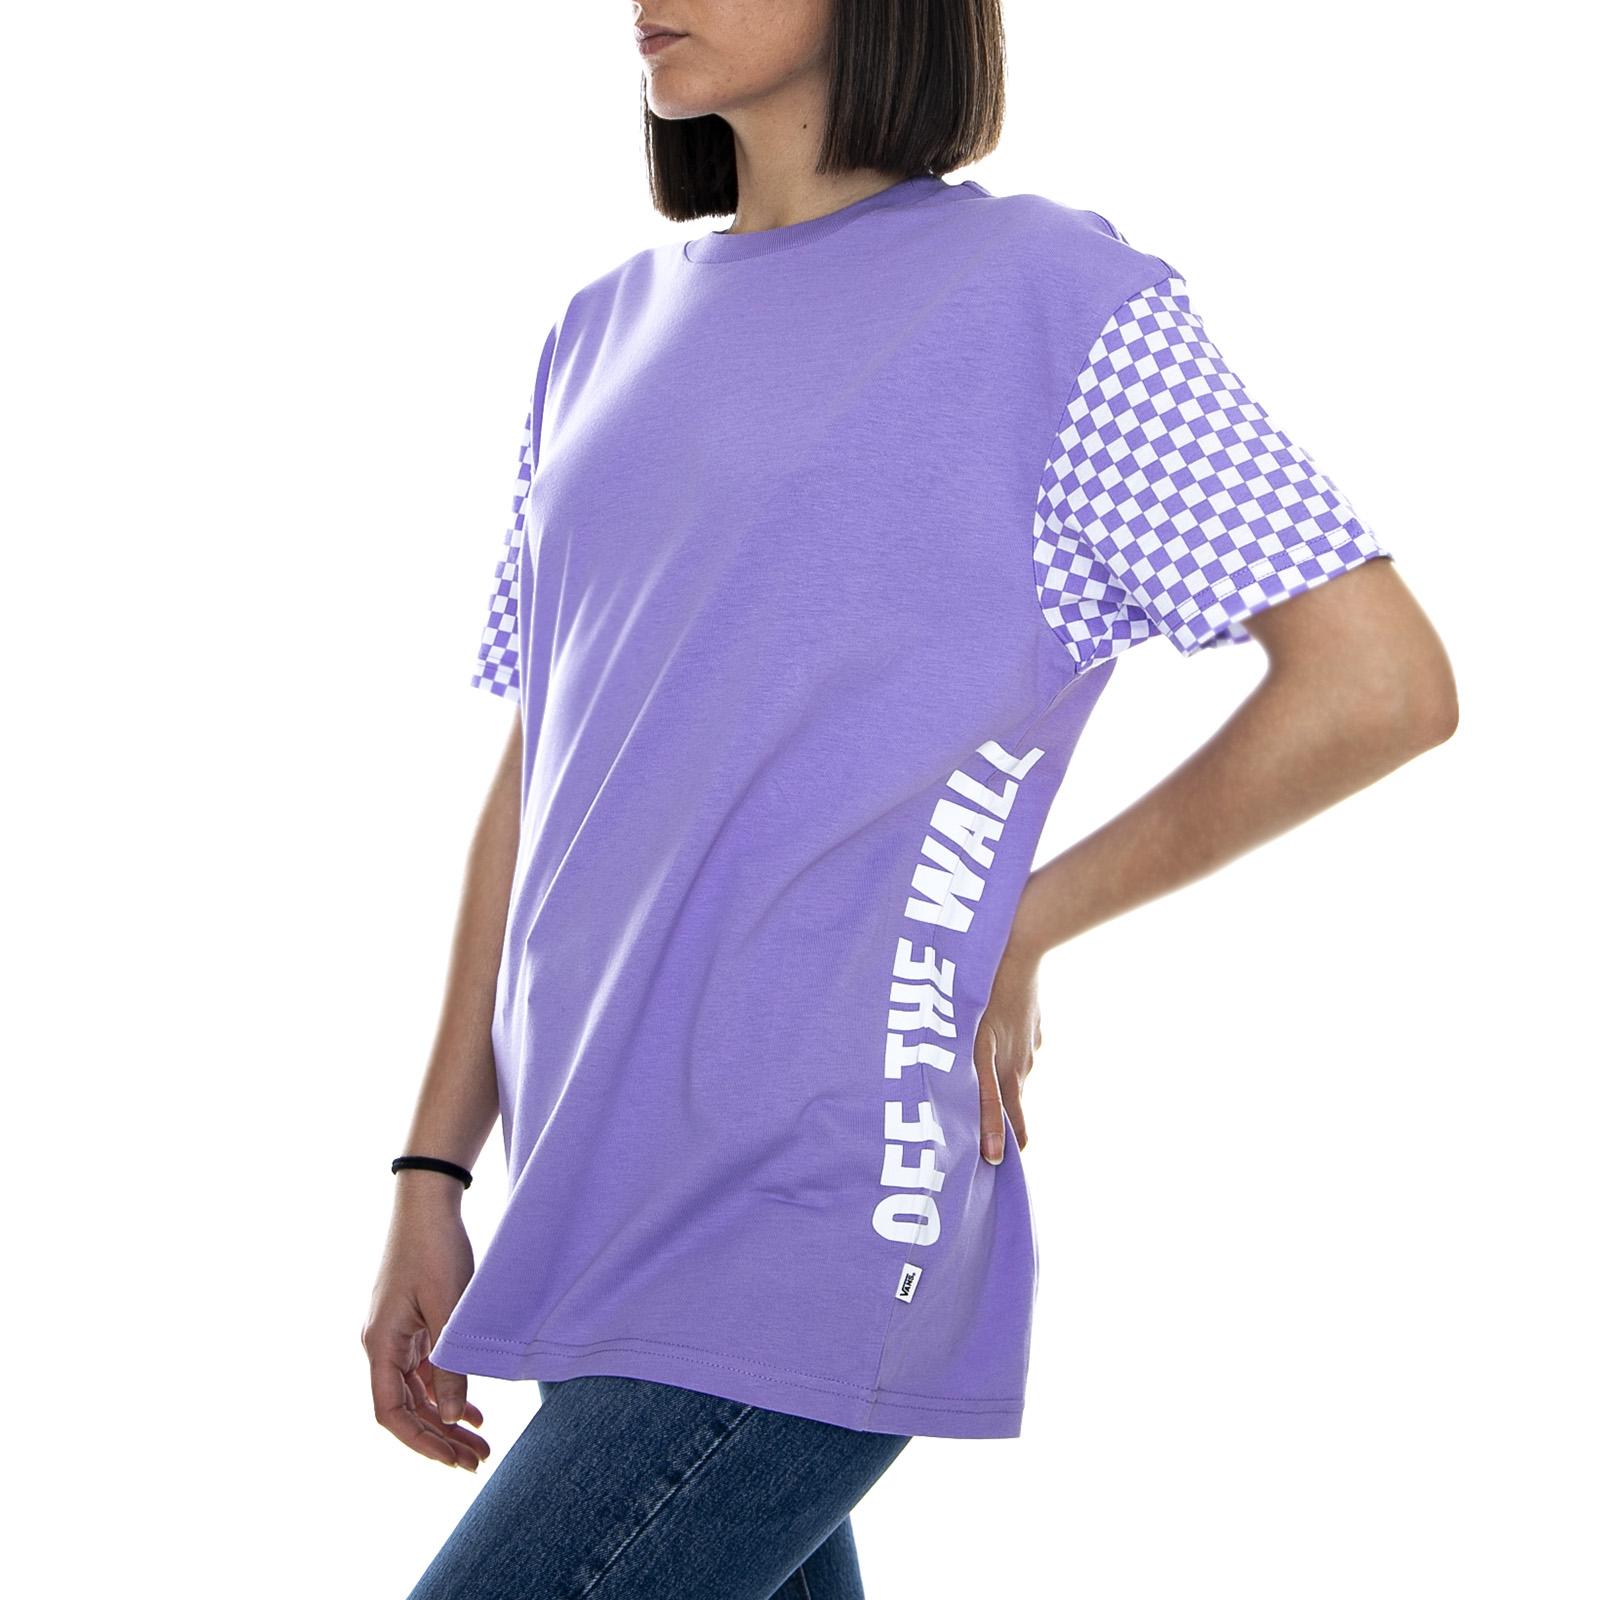 Maglietta Central Violet Vans Emea Girocollo Wm ViolaEbay Donna srxtCQdohB